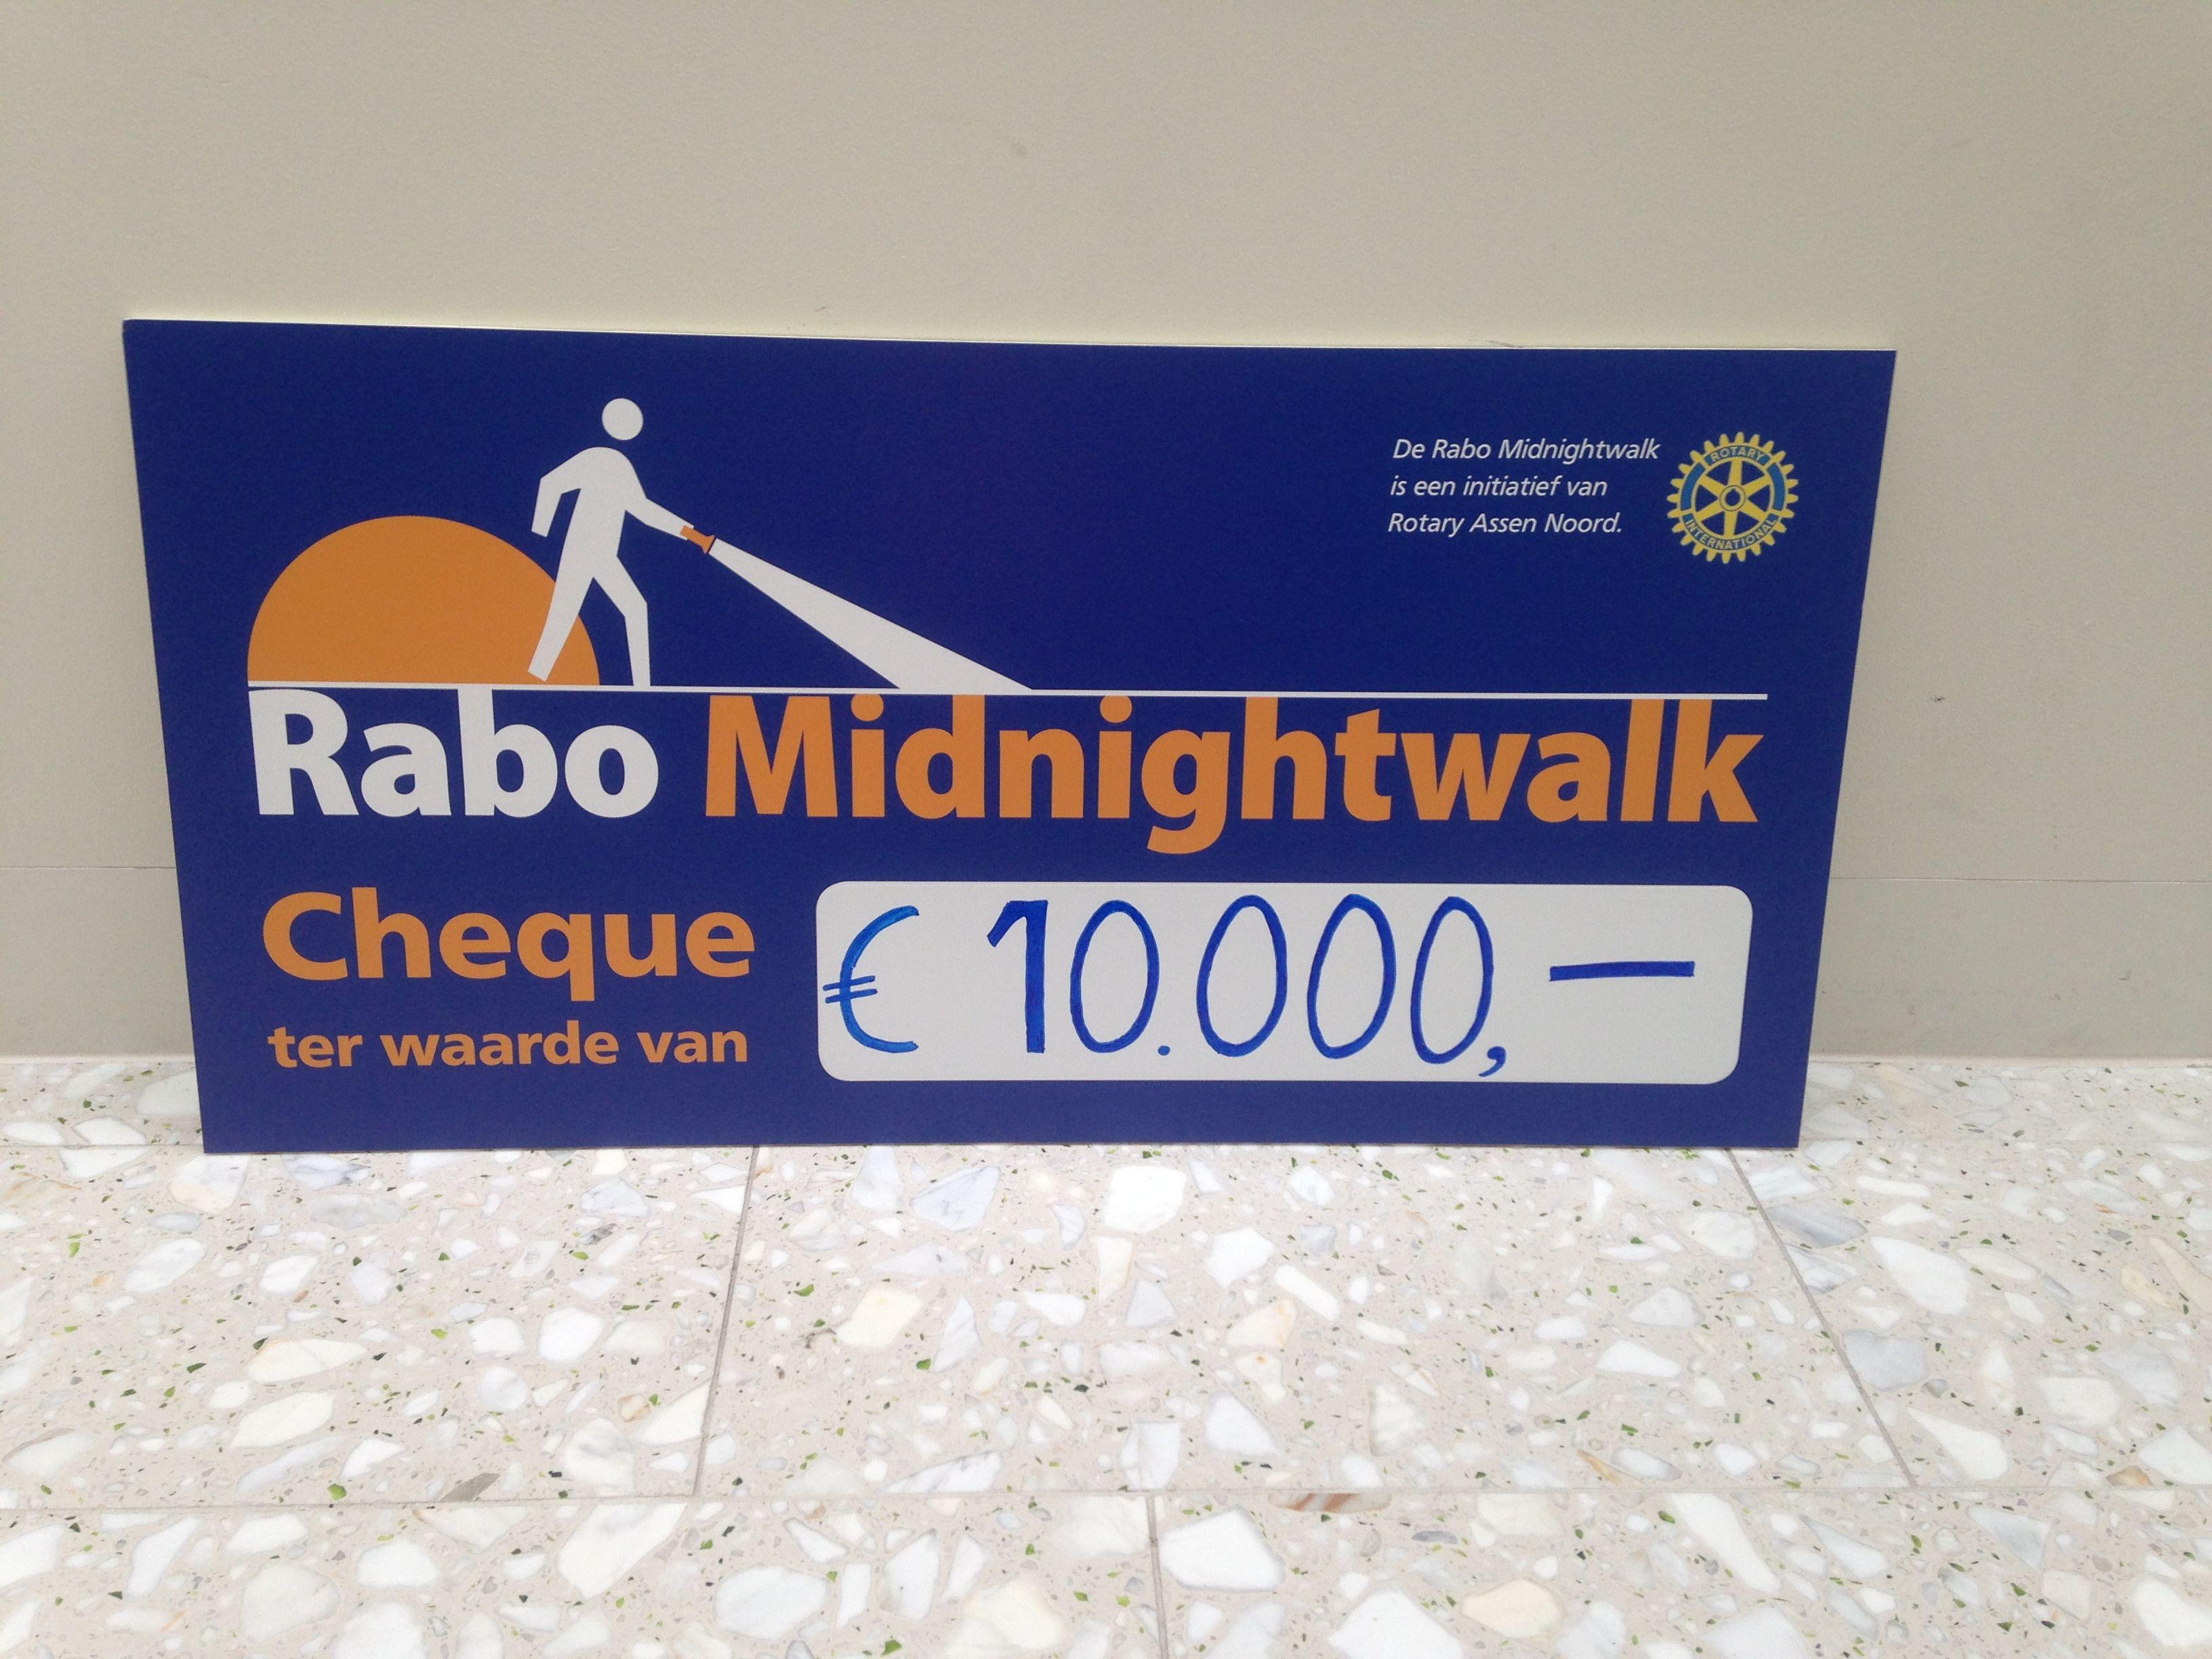 Rabo Midnightwalk 2014 groot succes